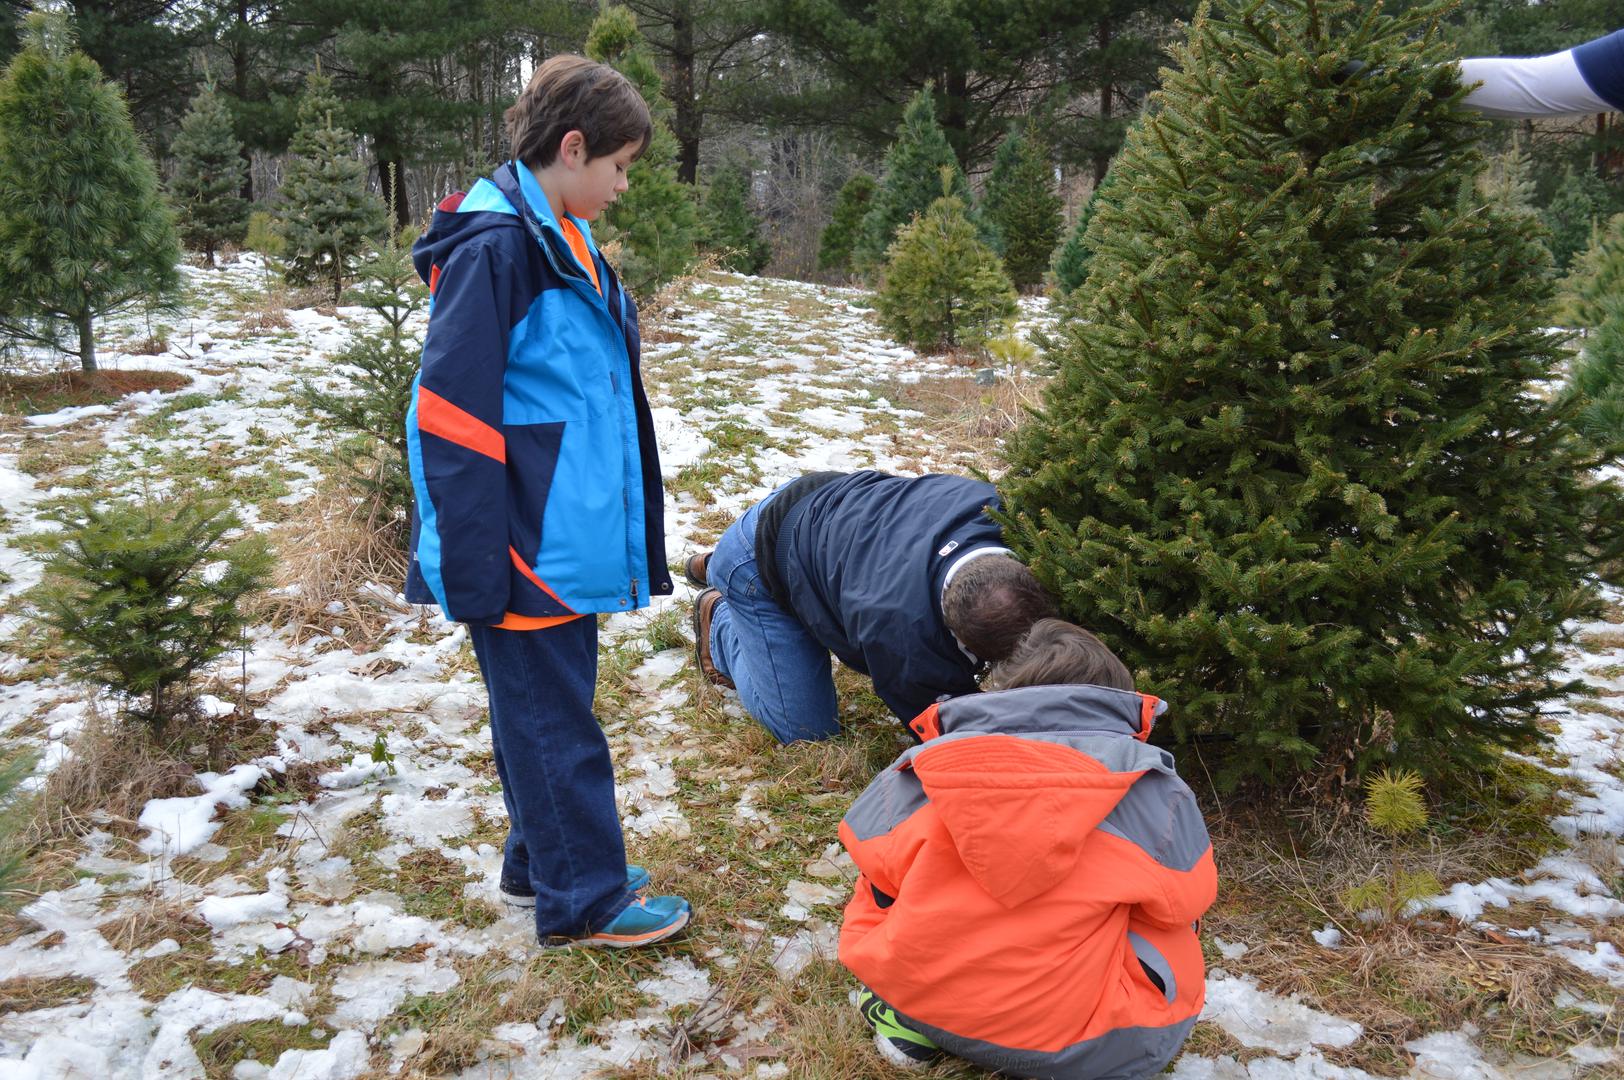 Christmas Tree Experience - Mm3 Associates, Llc - Cleveland, Oh